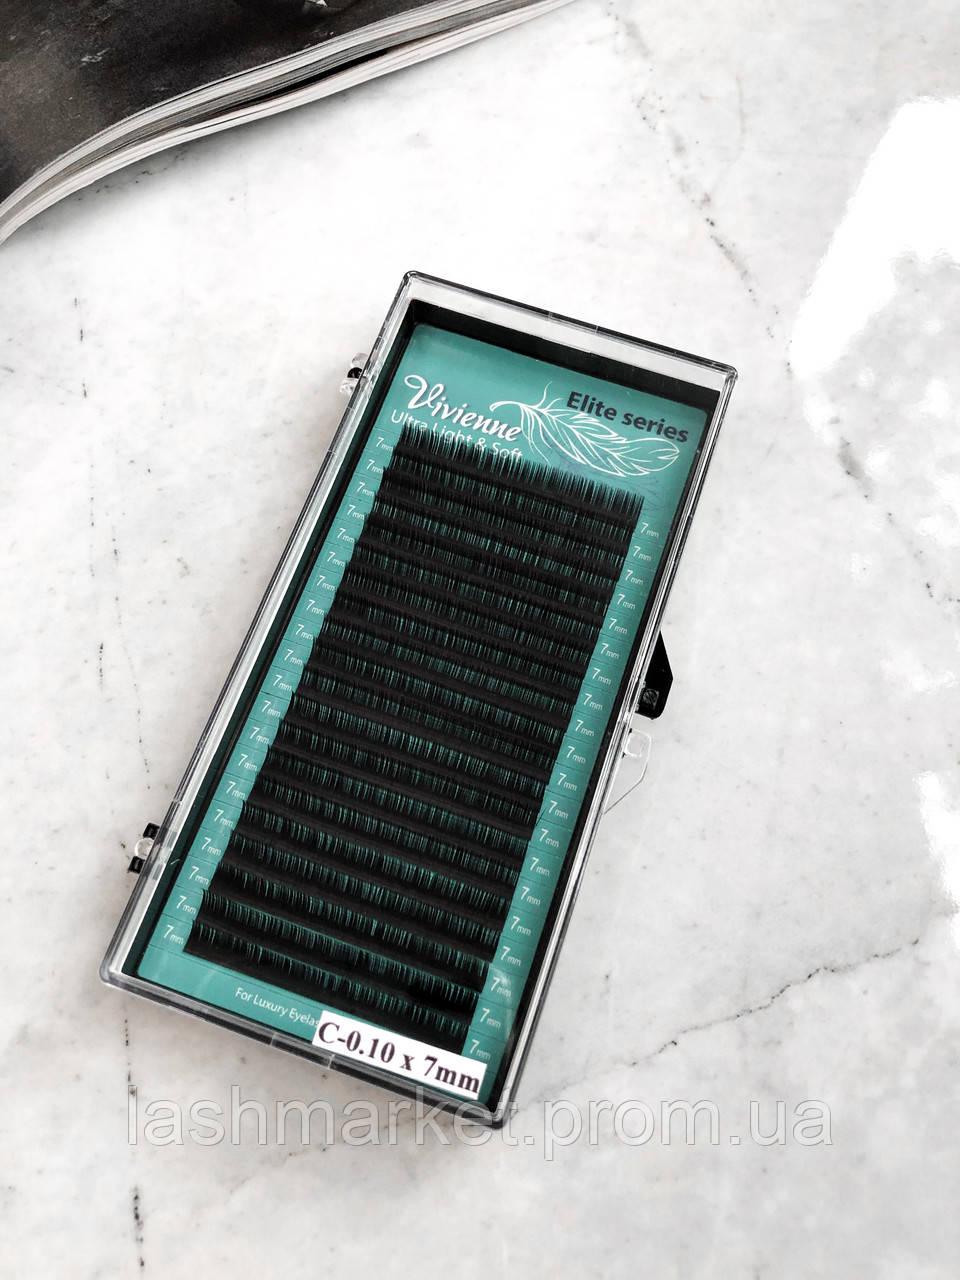 Ресницы для наращивания Vivienne Elite Series, Dark Brown  D 0.07 9 mm